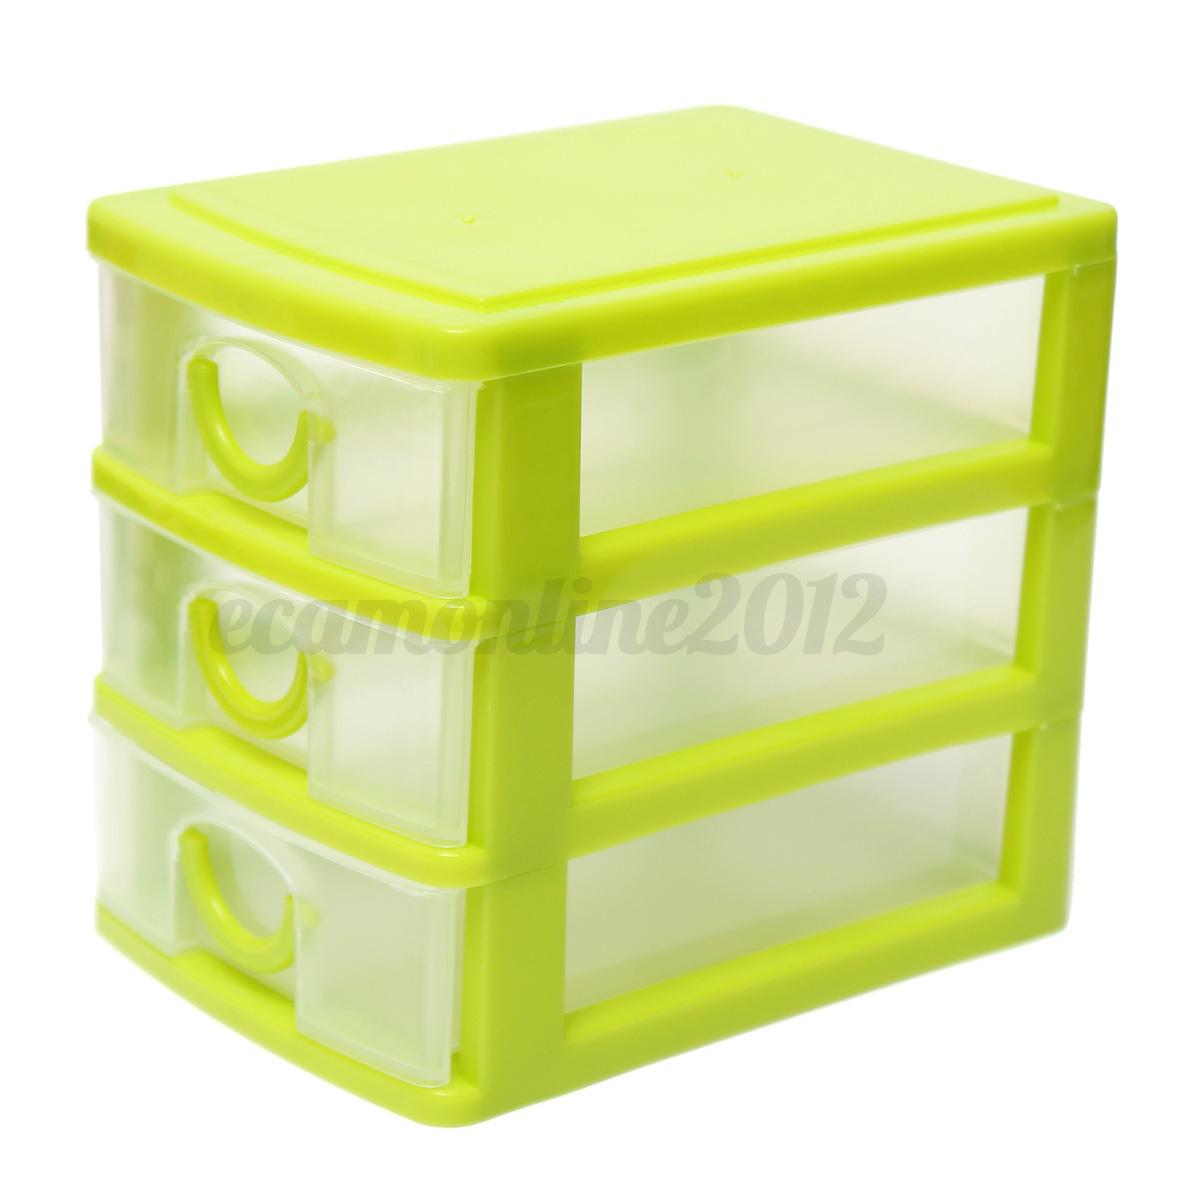 4 colores pl stico caja almacenaje storage box organizador - Caja almacenaje plastico ...